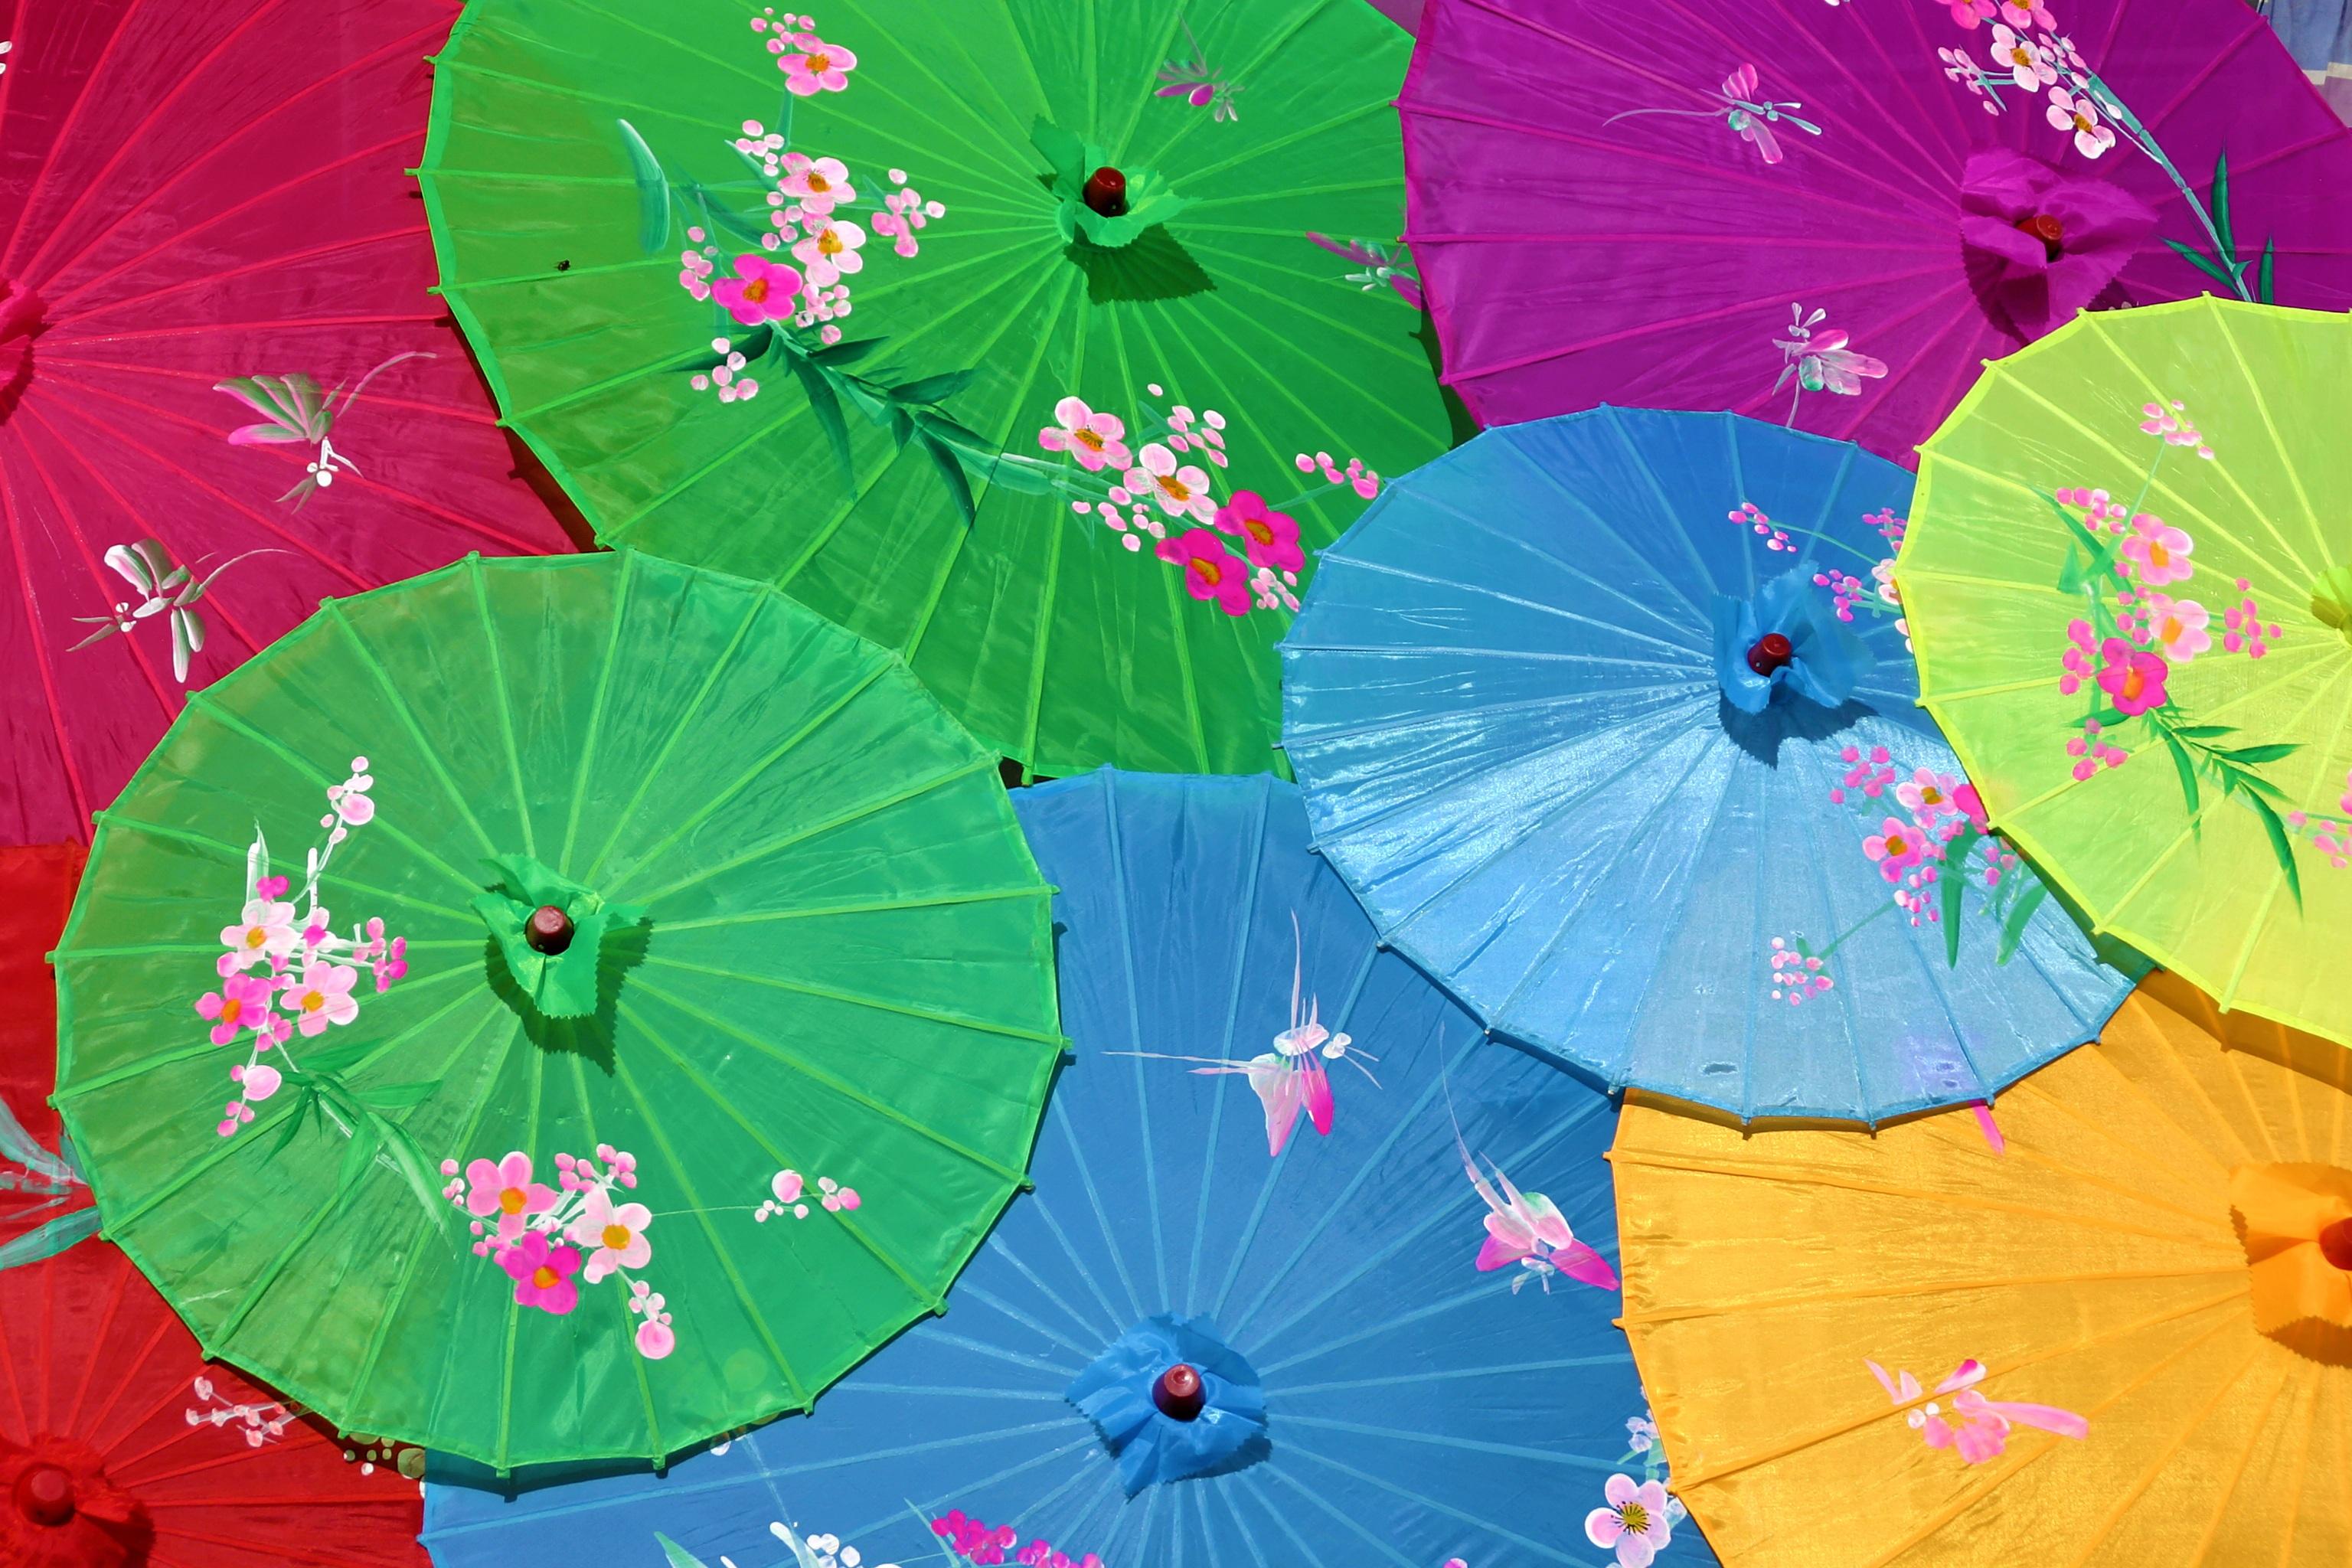 Free Images : wheel, flower, petal, umbrella, color, colorful ...